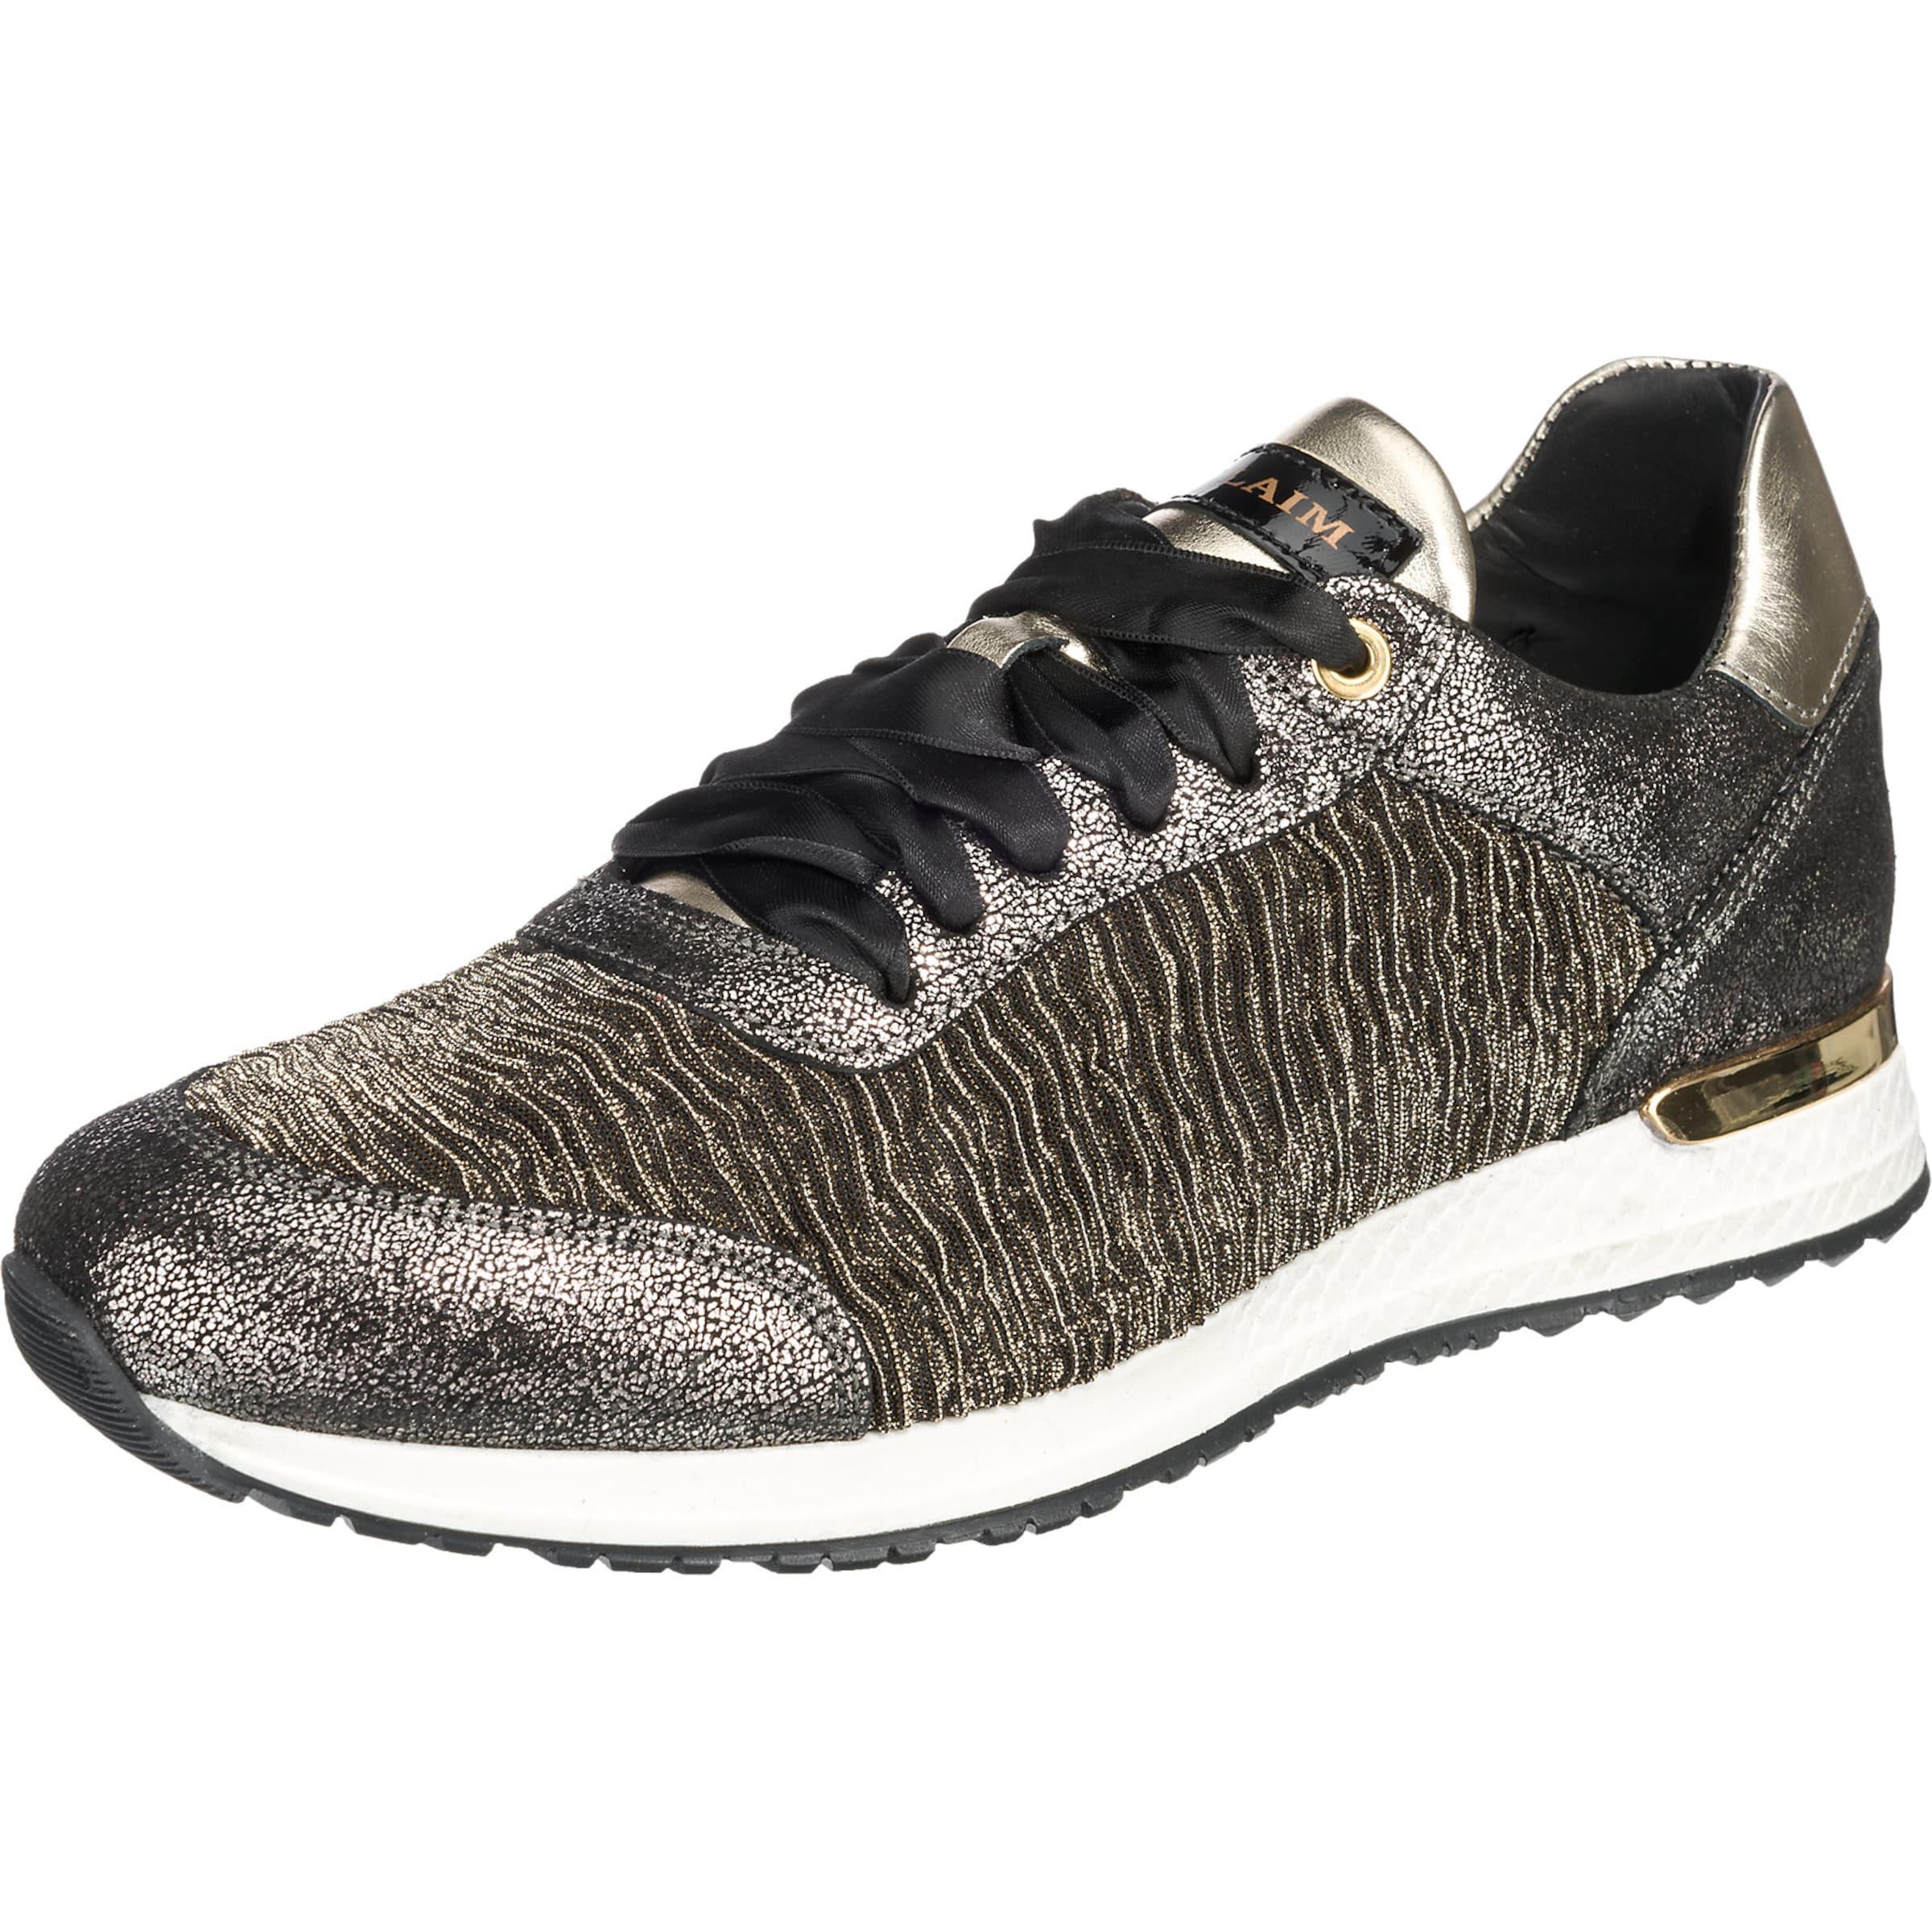 Haltbare Mode billige Schuhe NOCLAIM | 'Glory' Sneakers Schuhe Gut getragene Schuhe